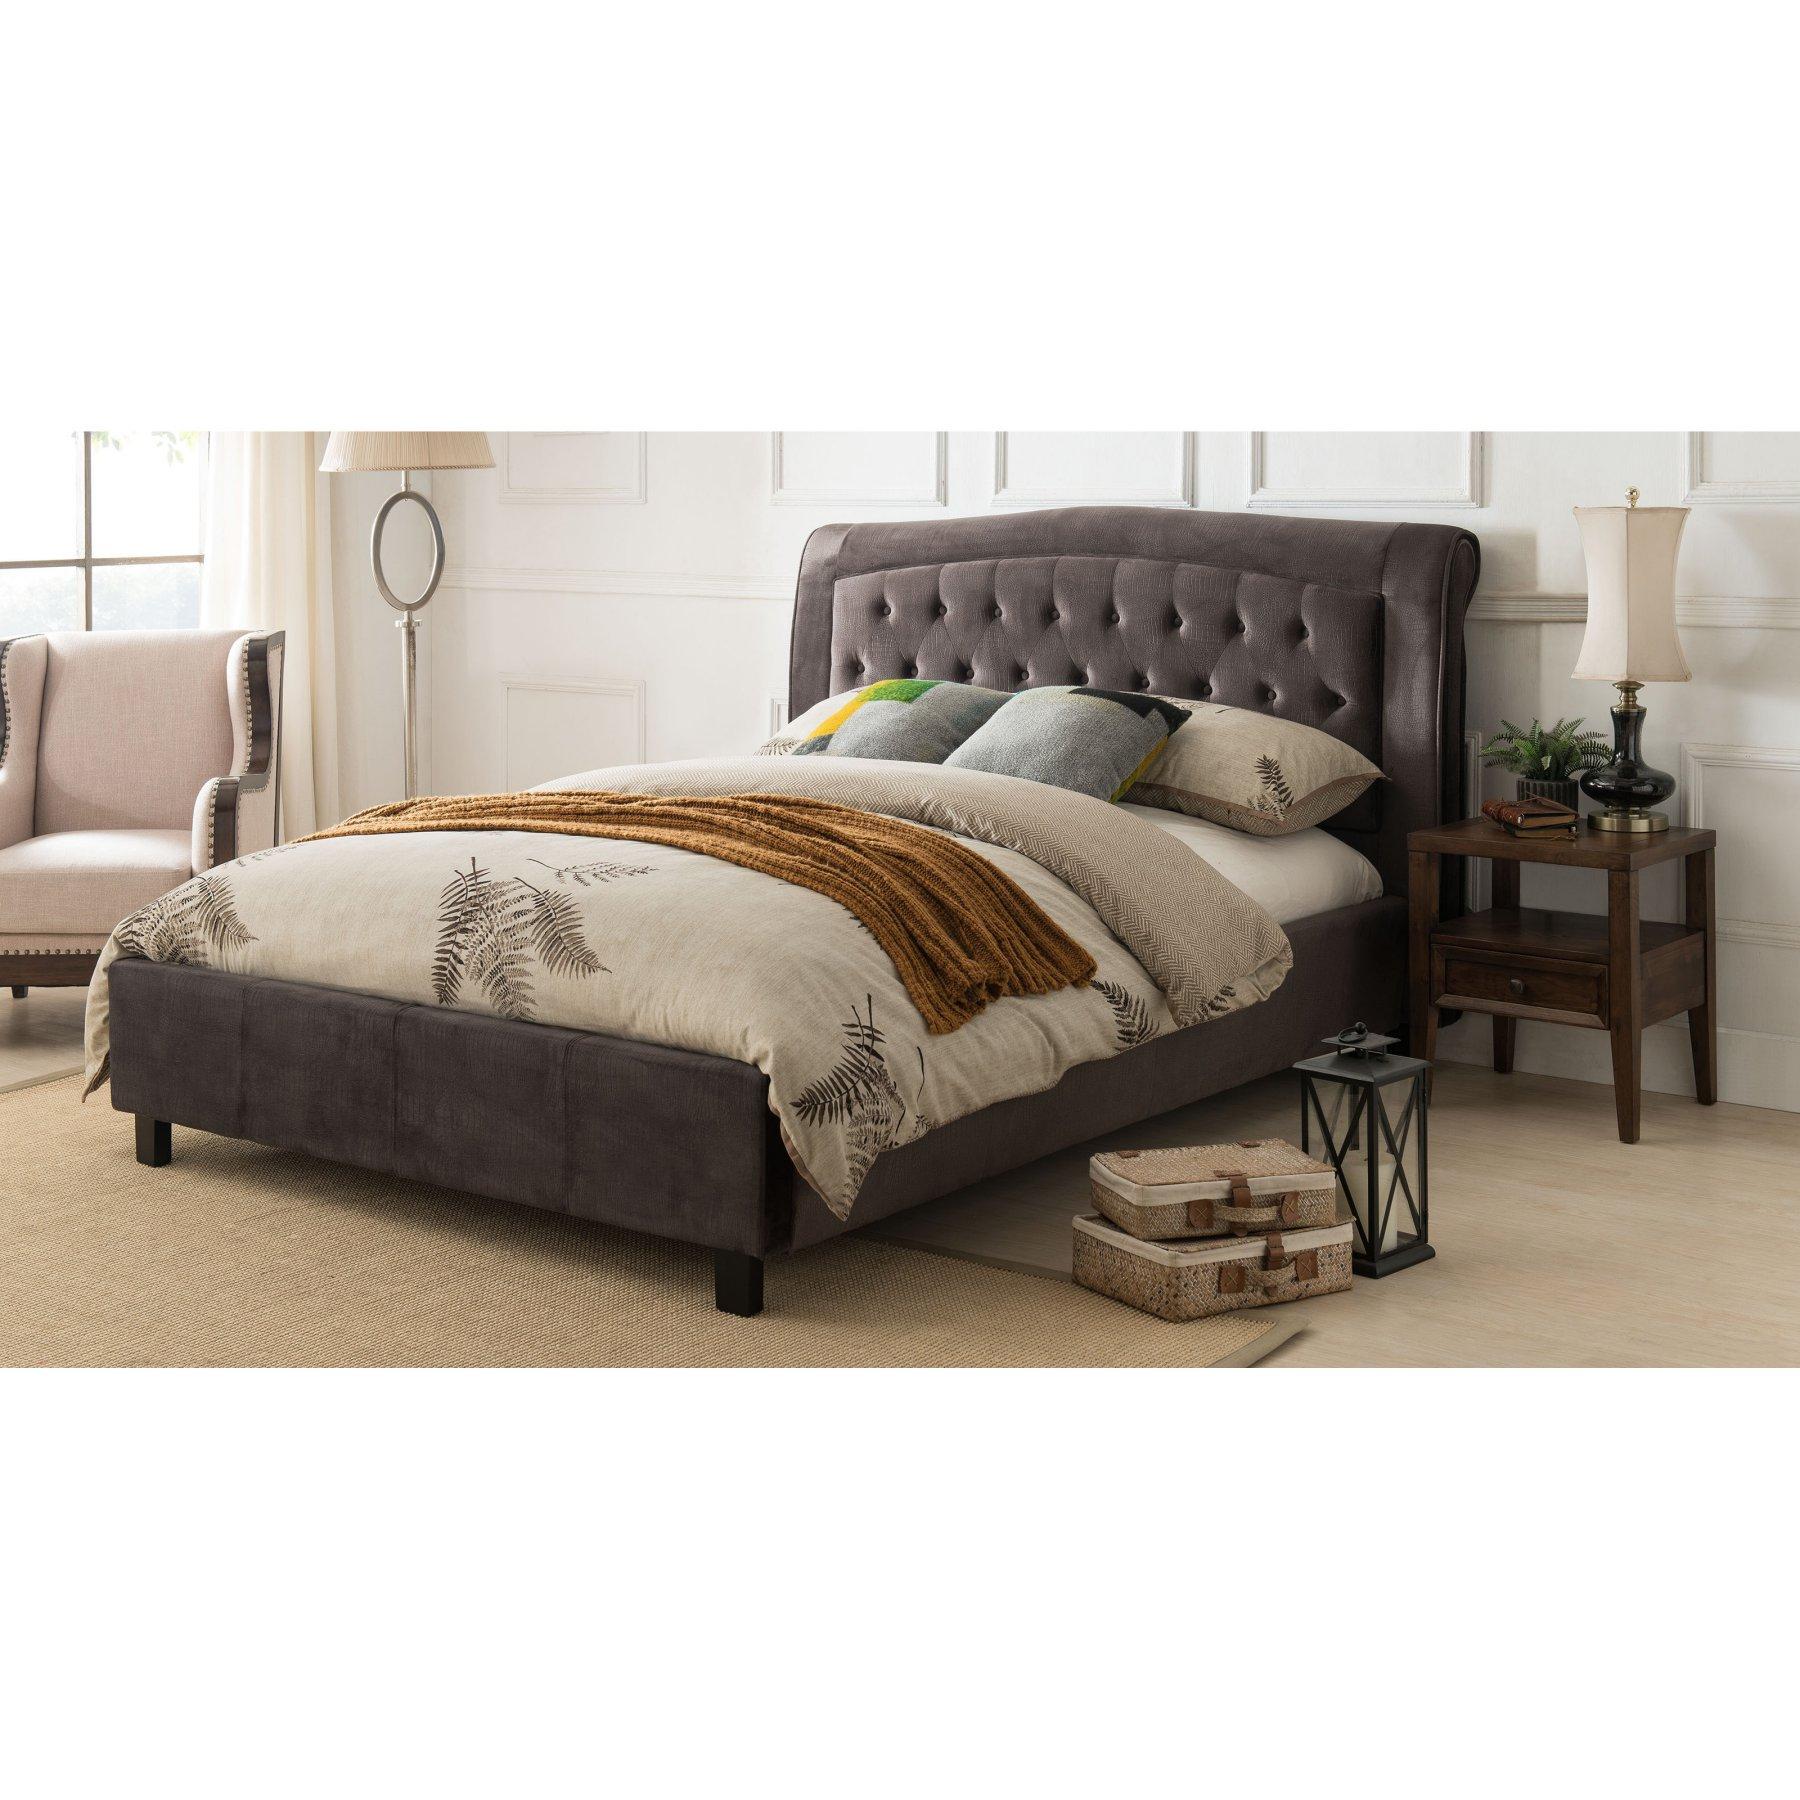 Milton Greens Stars Desiree Upholstered Platform Bed  7512 Gray Queen